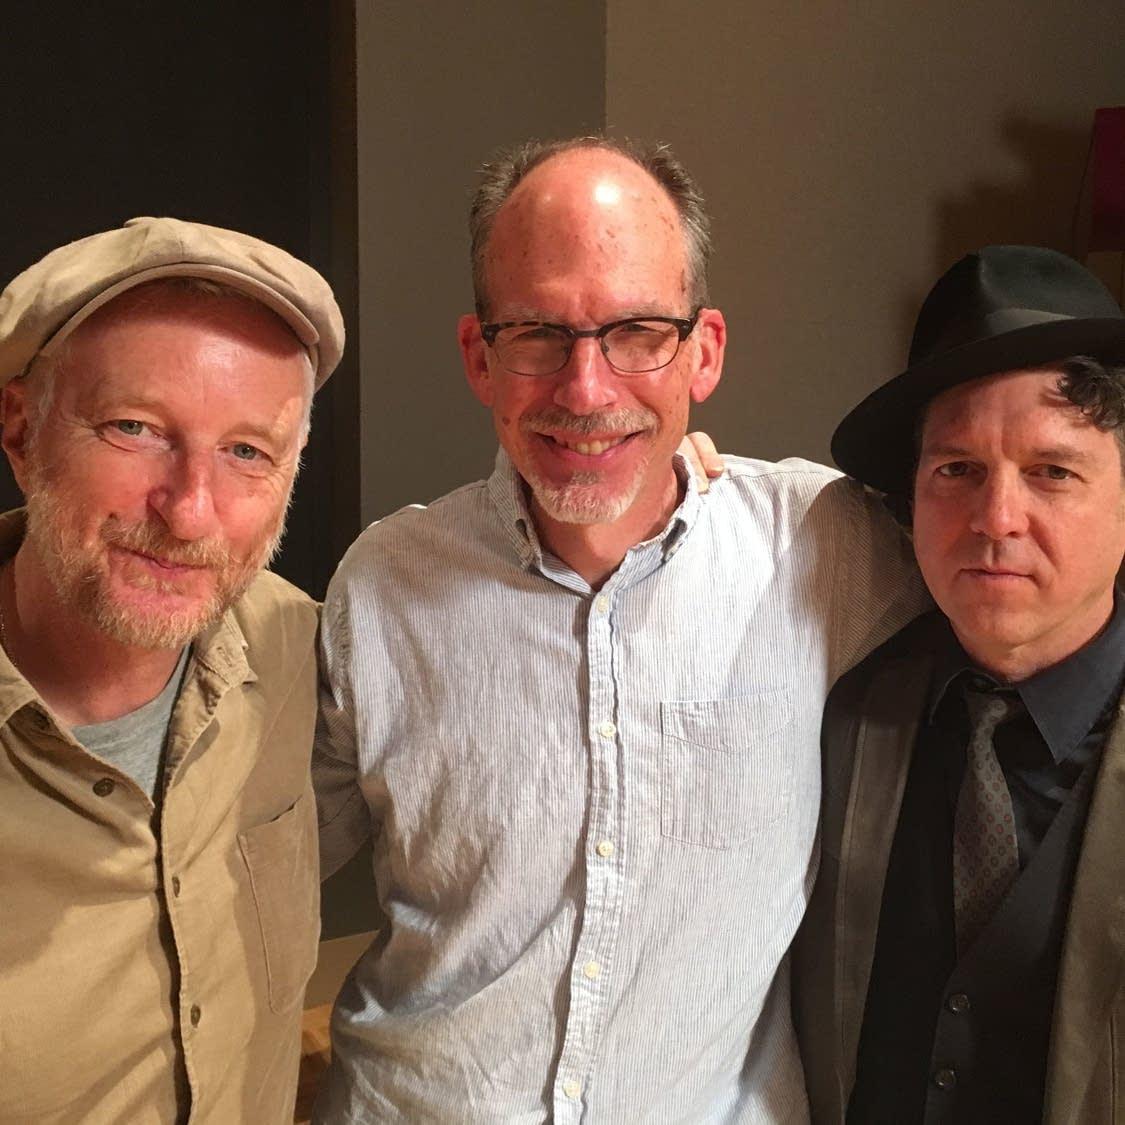 Billy Bragg, Mike Pengra and Joe Henry